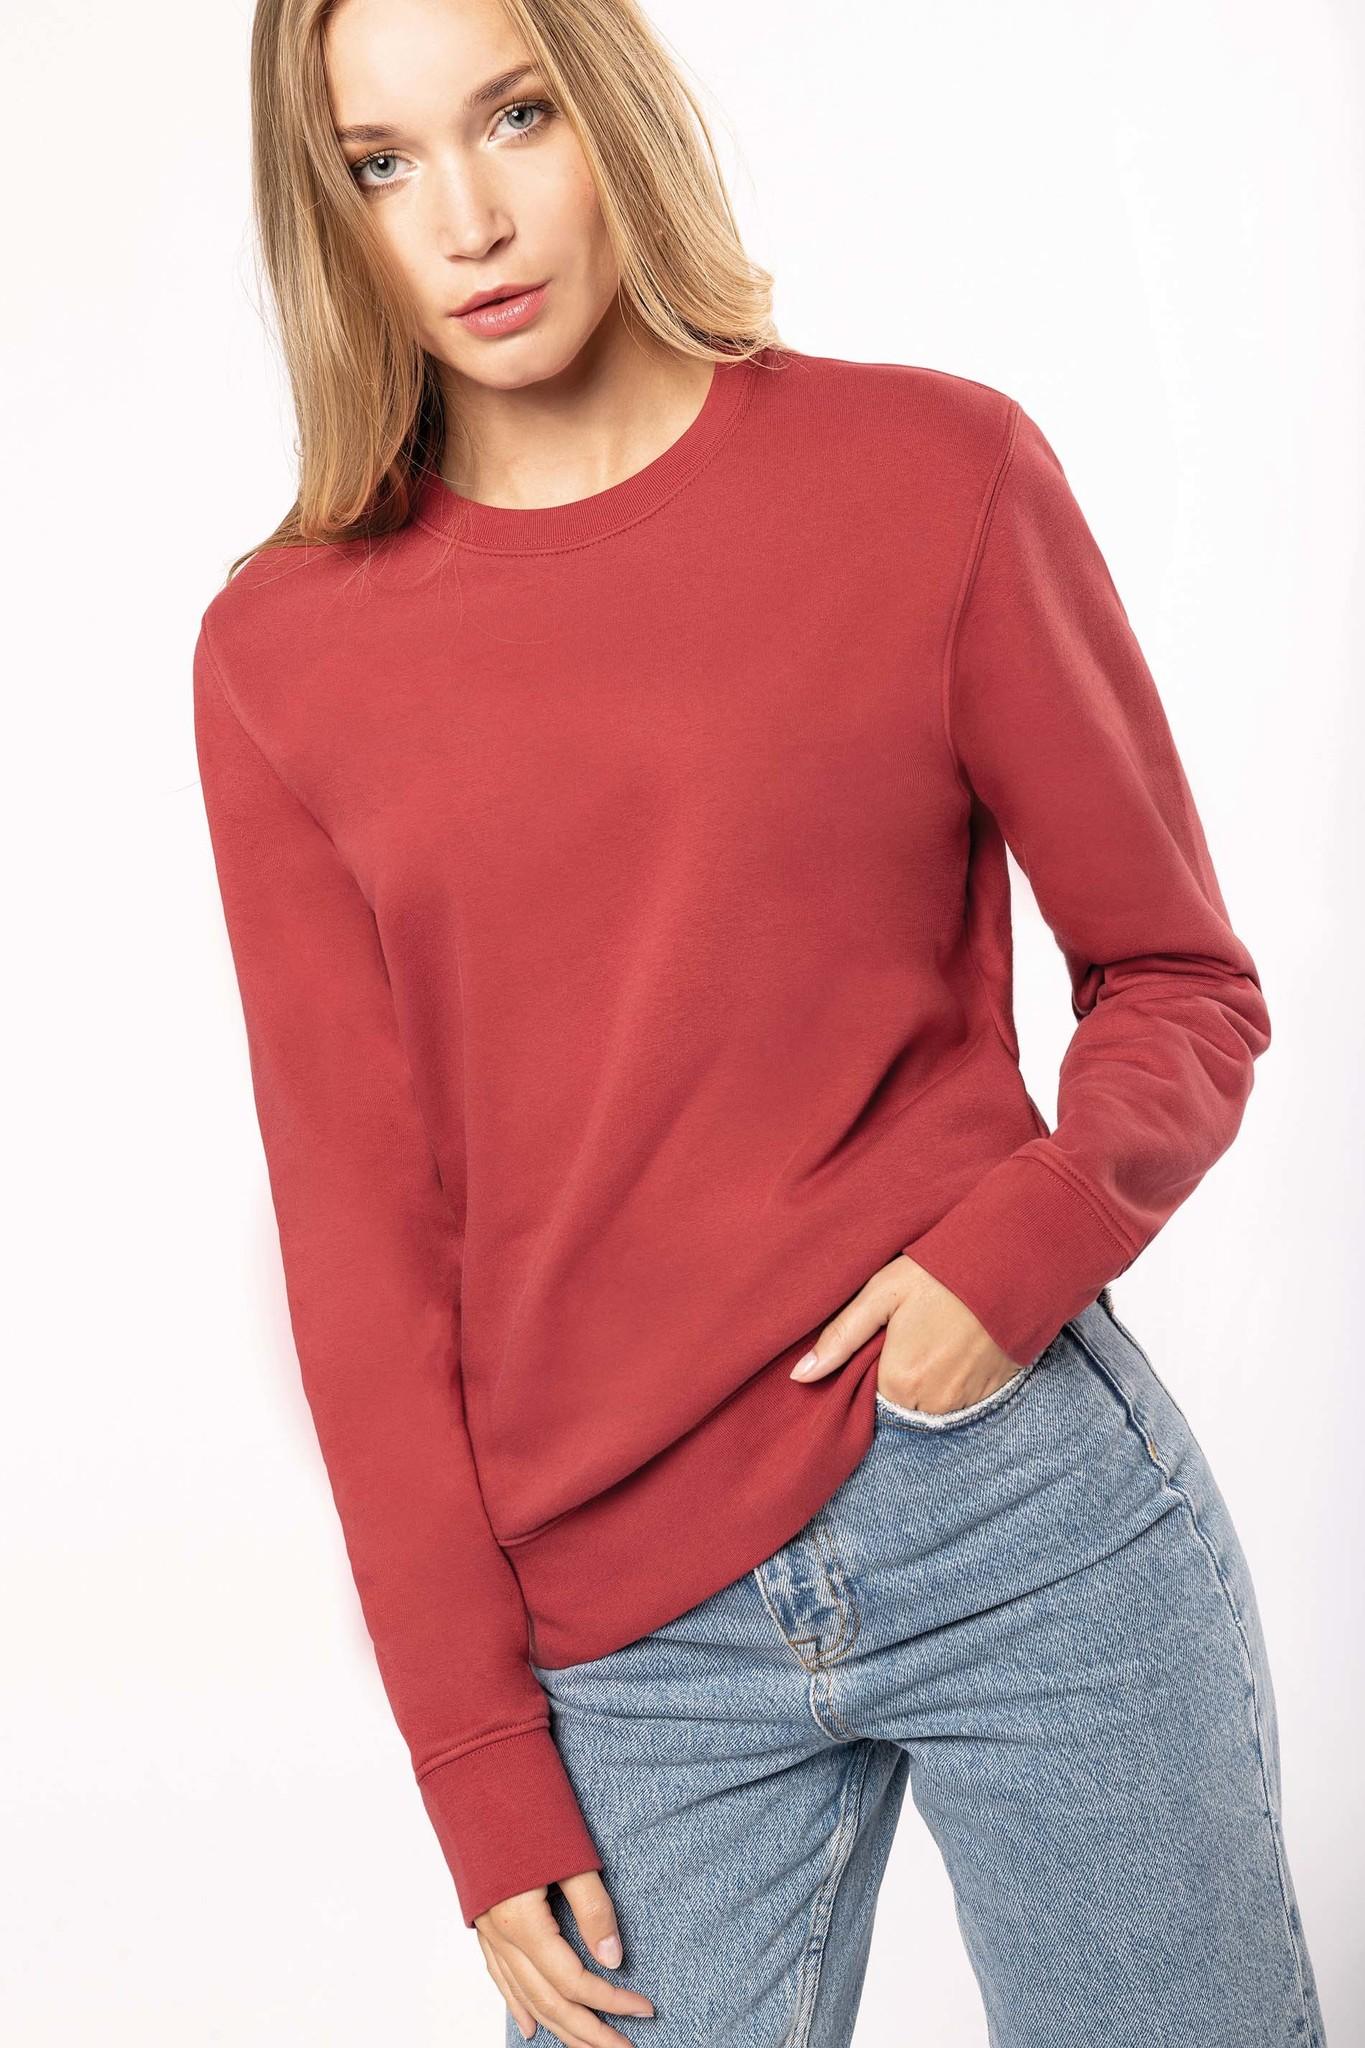 Eco-Friendly Sweater UNI Green Marble-Gemêleerd